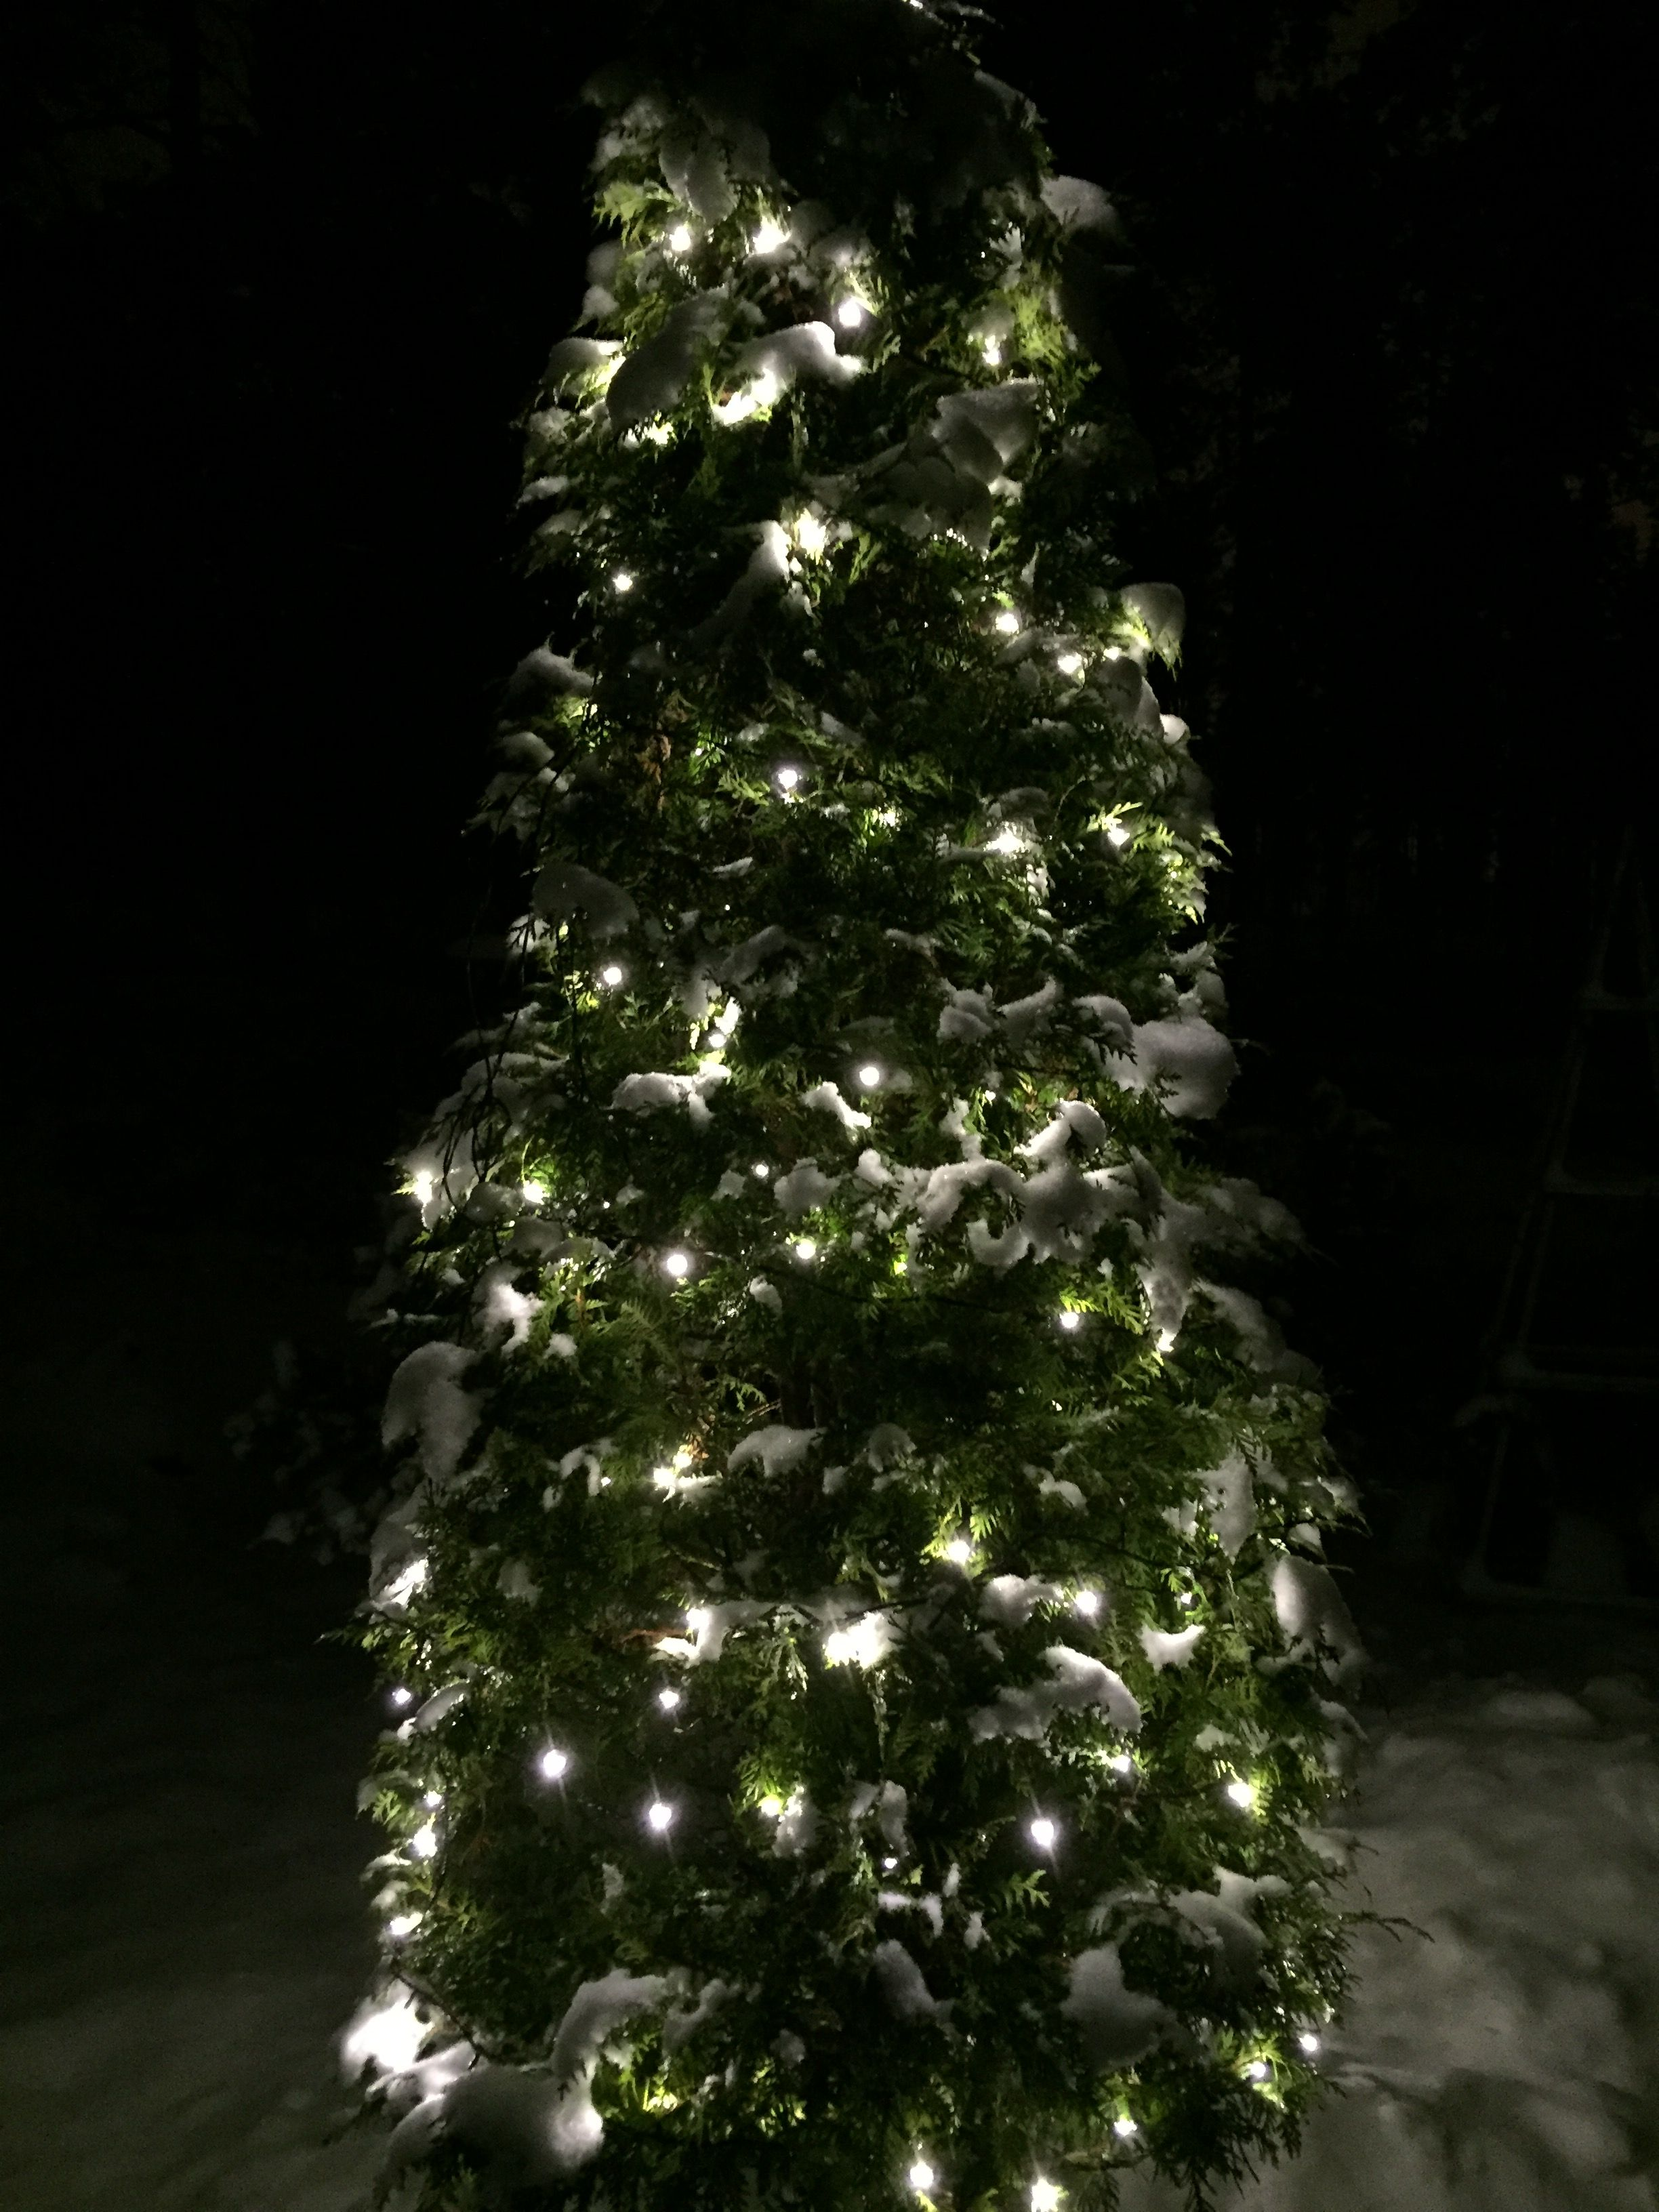 Joulupuu Holiday, Holiday decor, Christmas